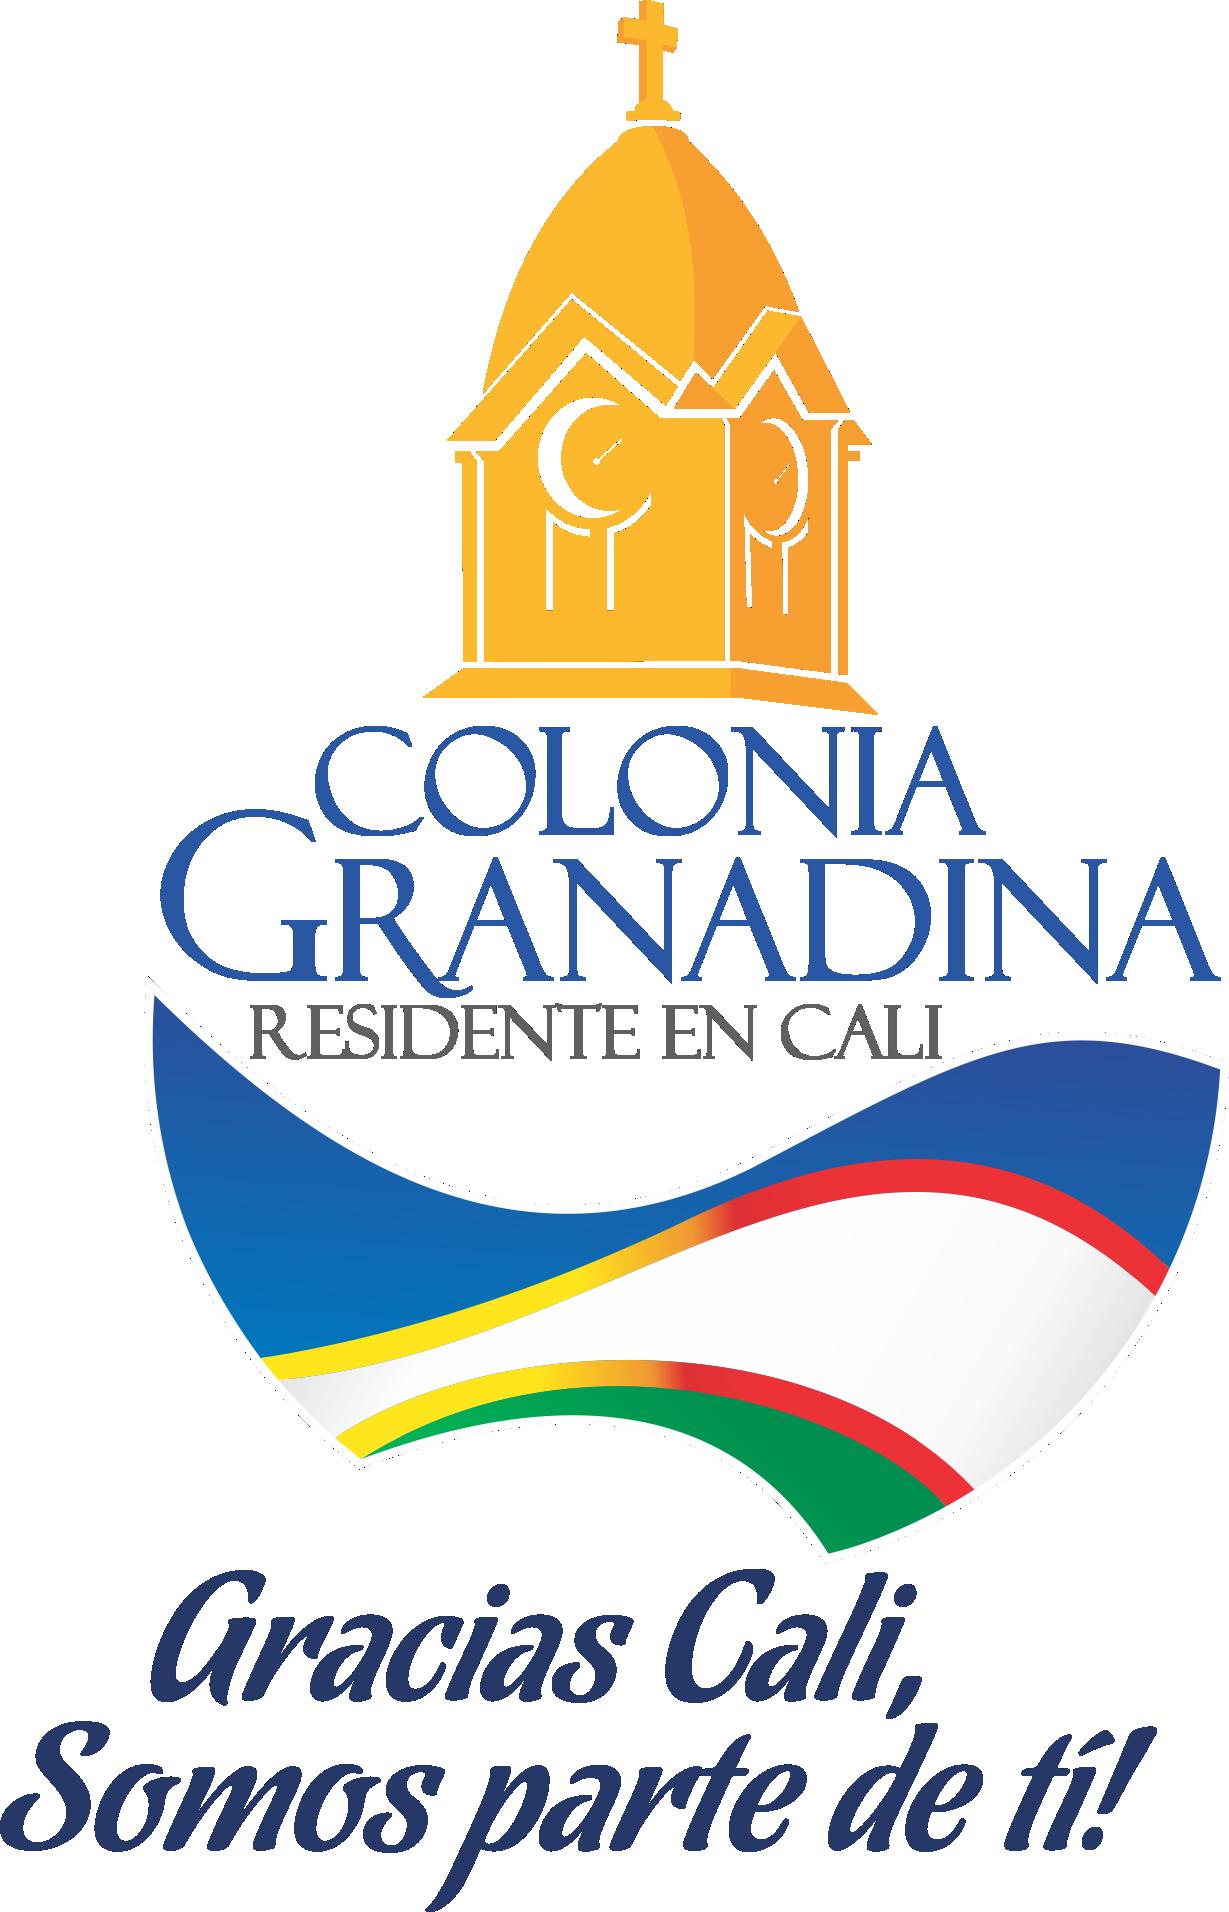 Colonia Granadina